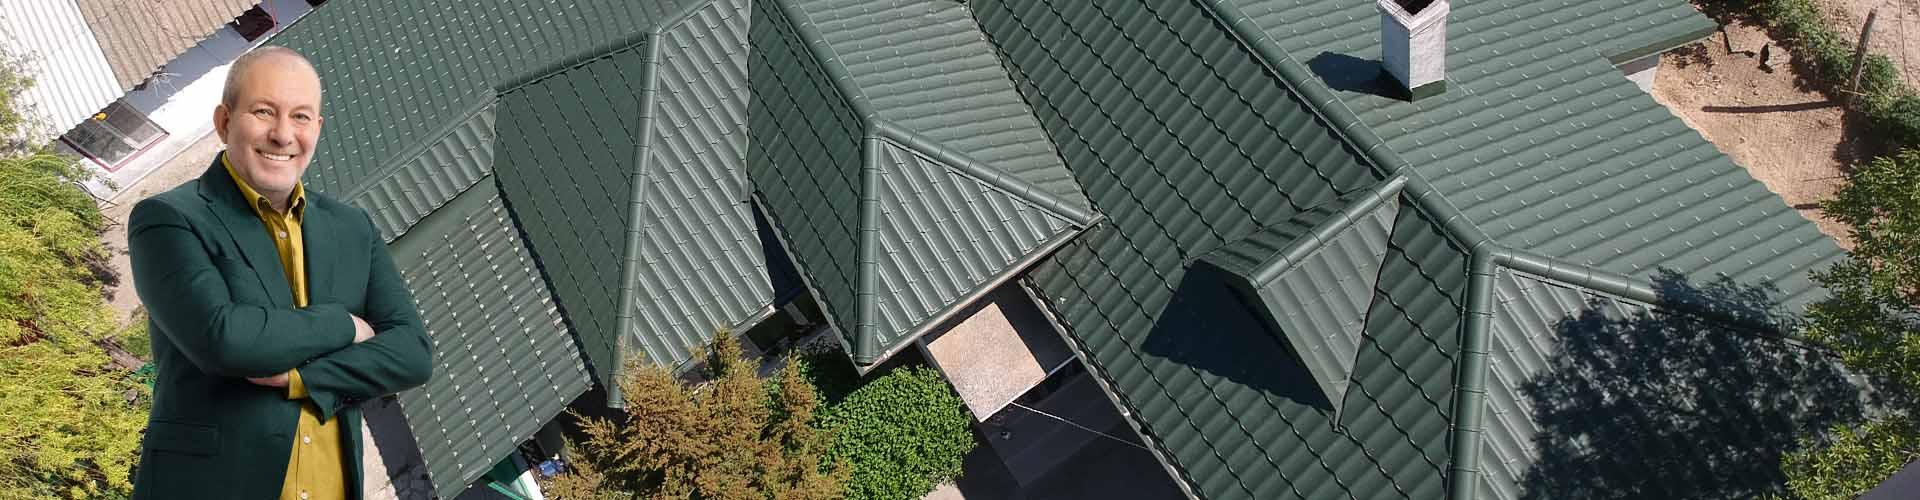 cel mai bun acoperis